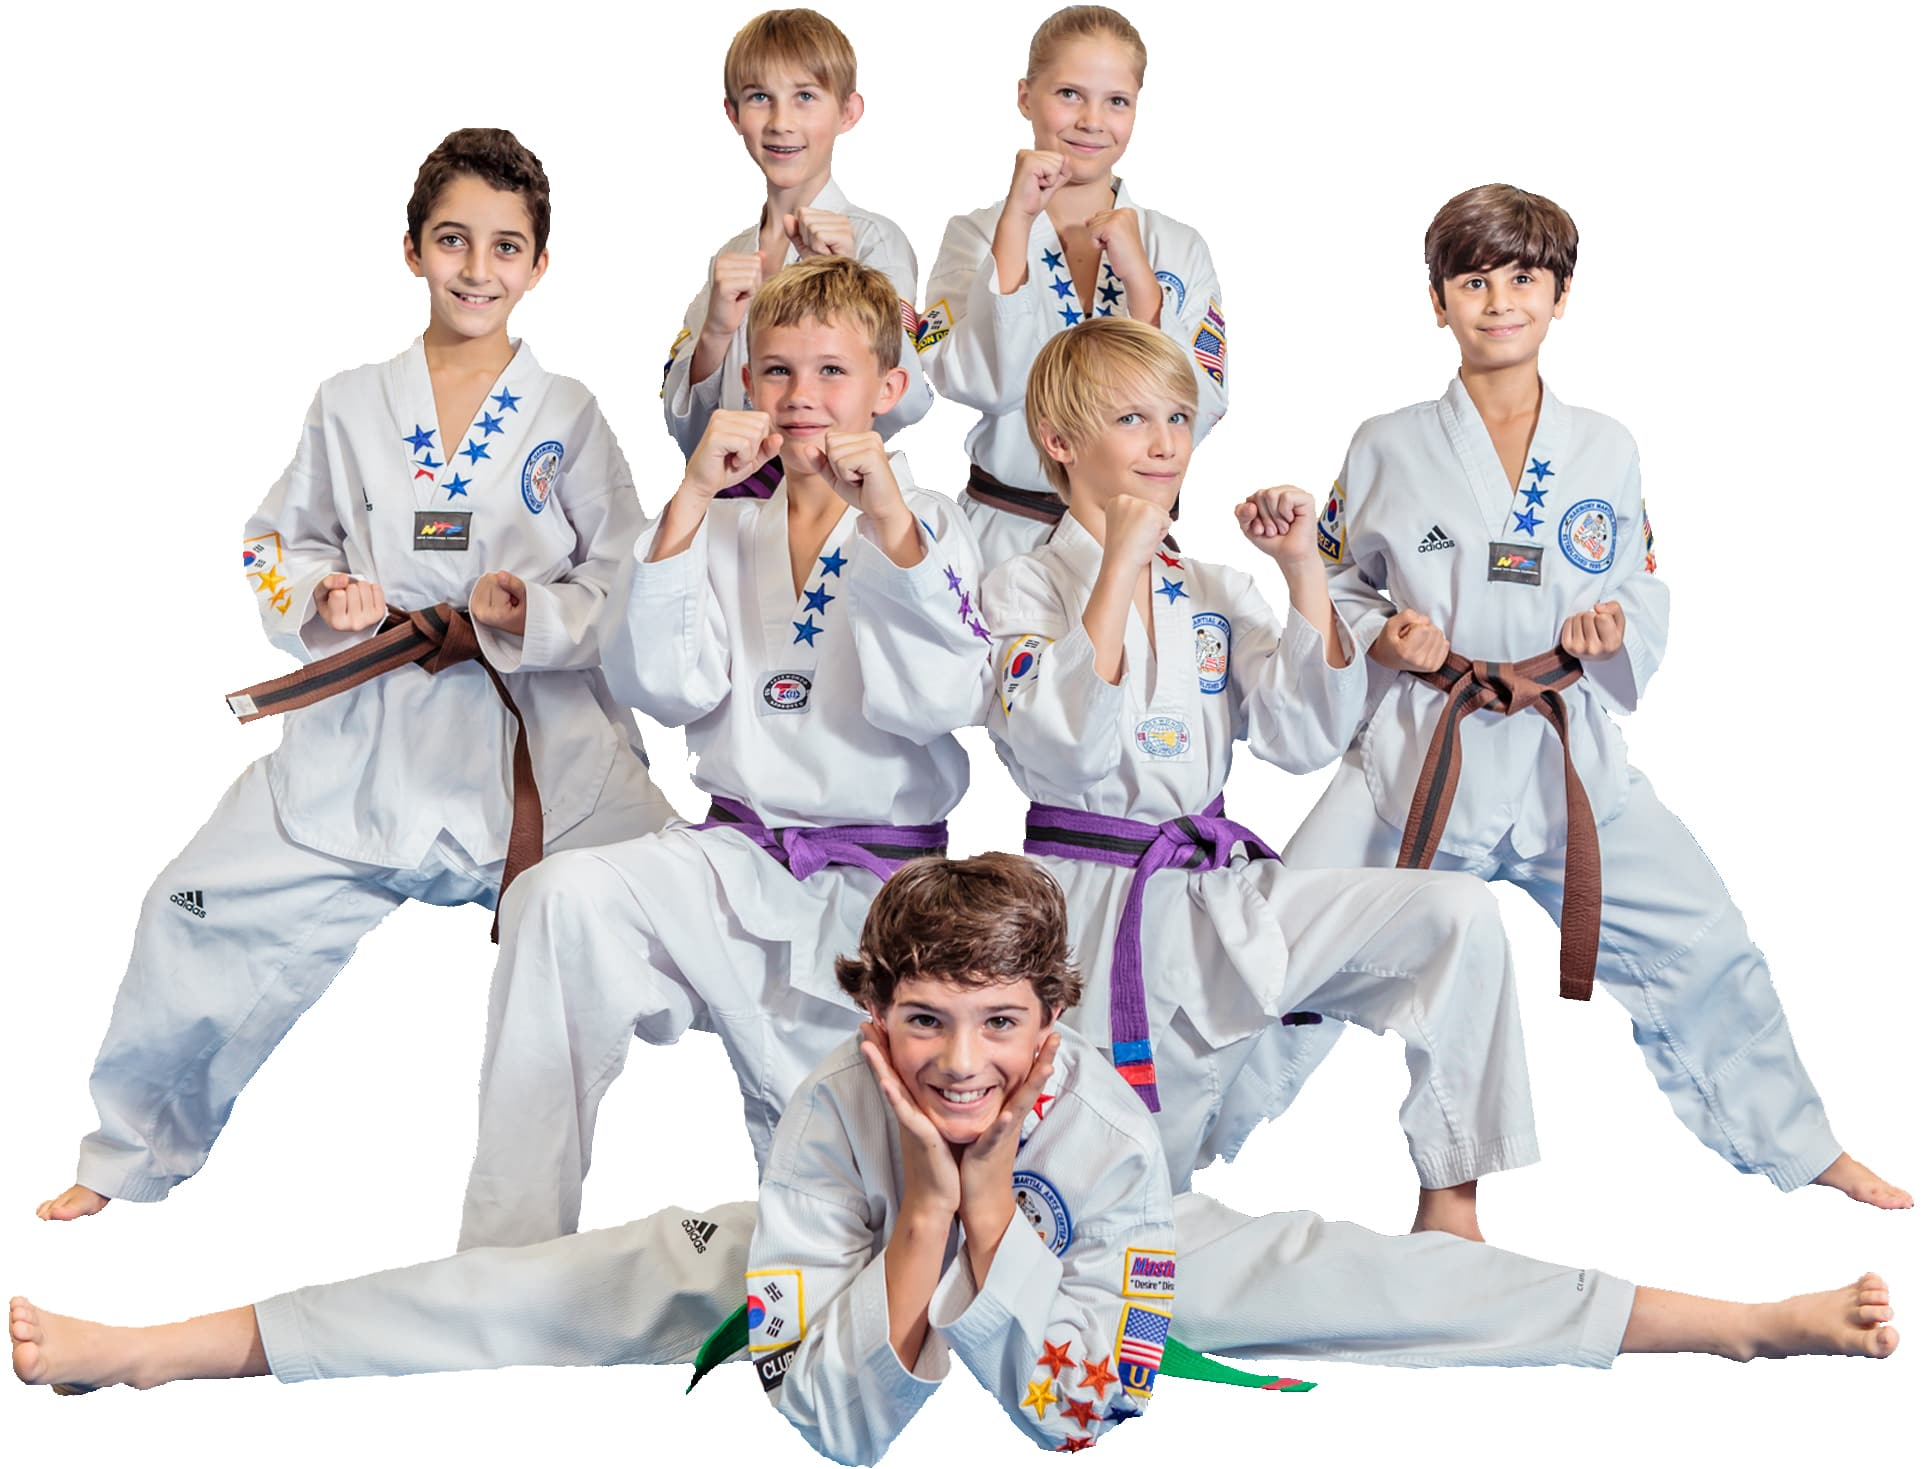 Children's Summer Camp 2018 in Jupiter - Harmony Martial Arts Center